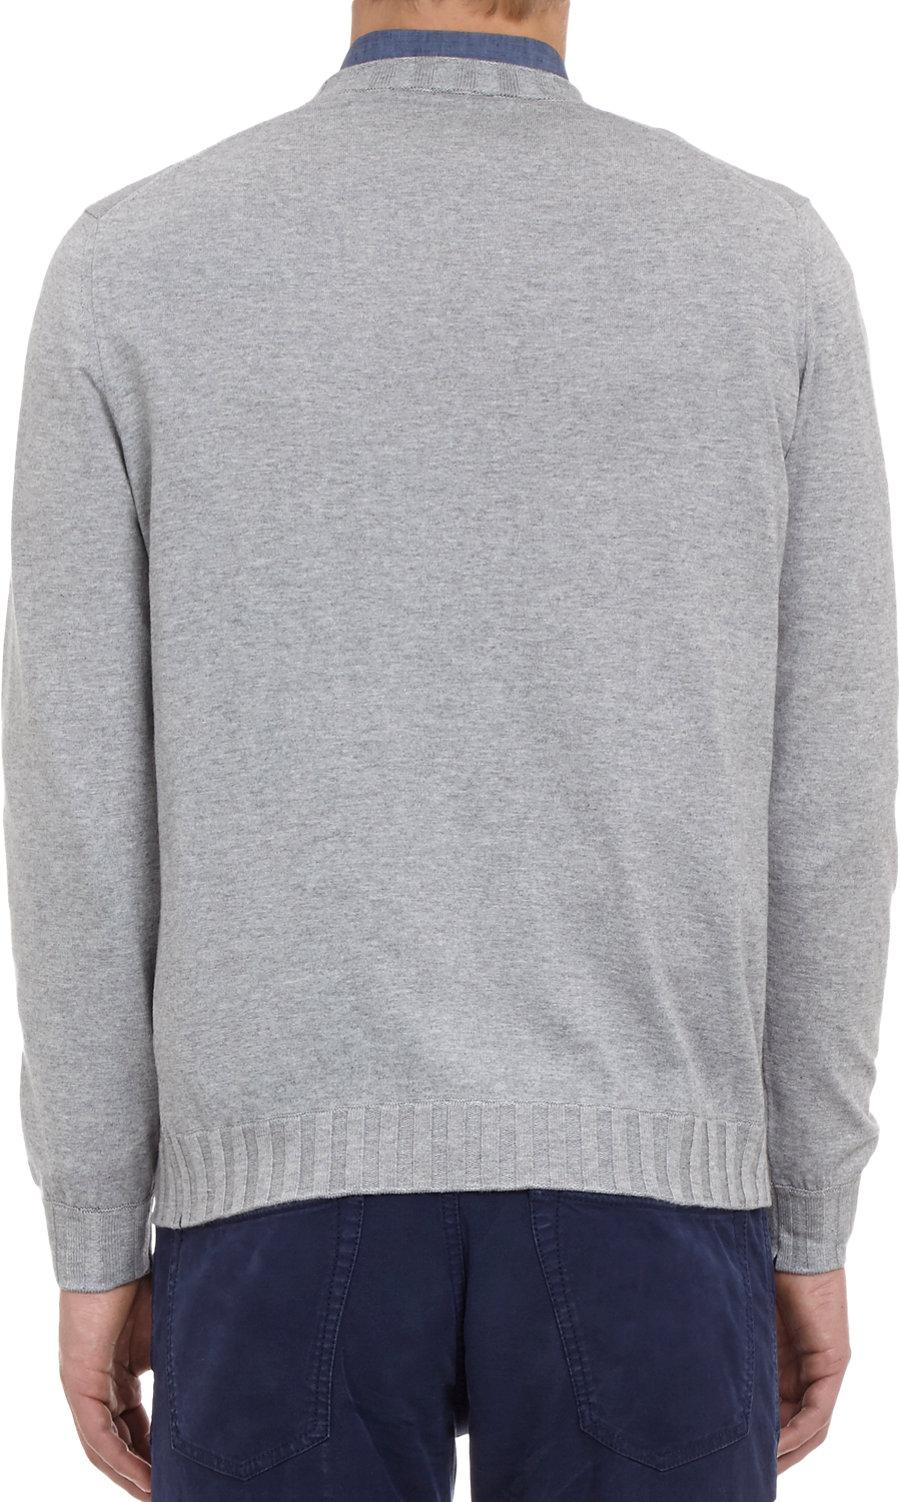 Fioroni Pullover Sweater in Gray for Men